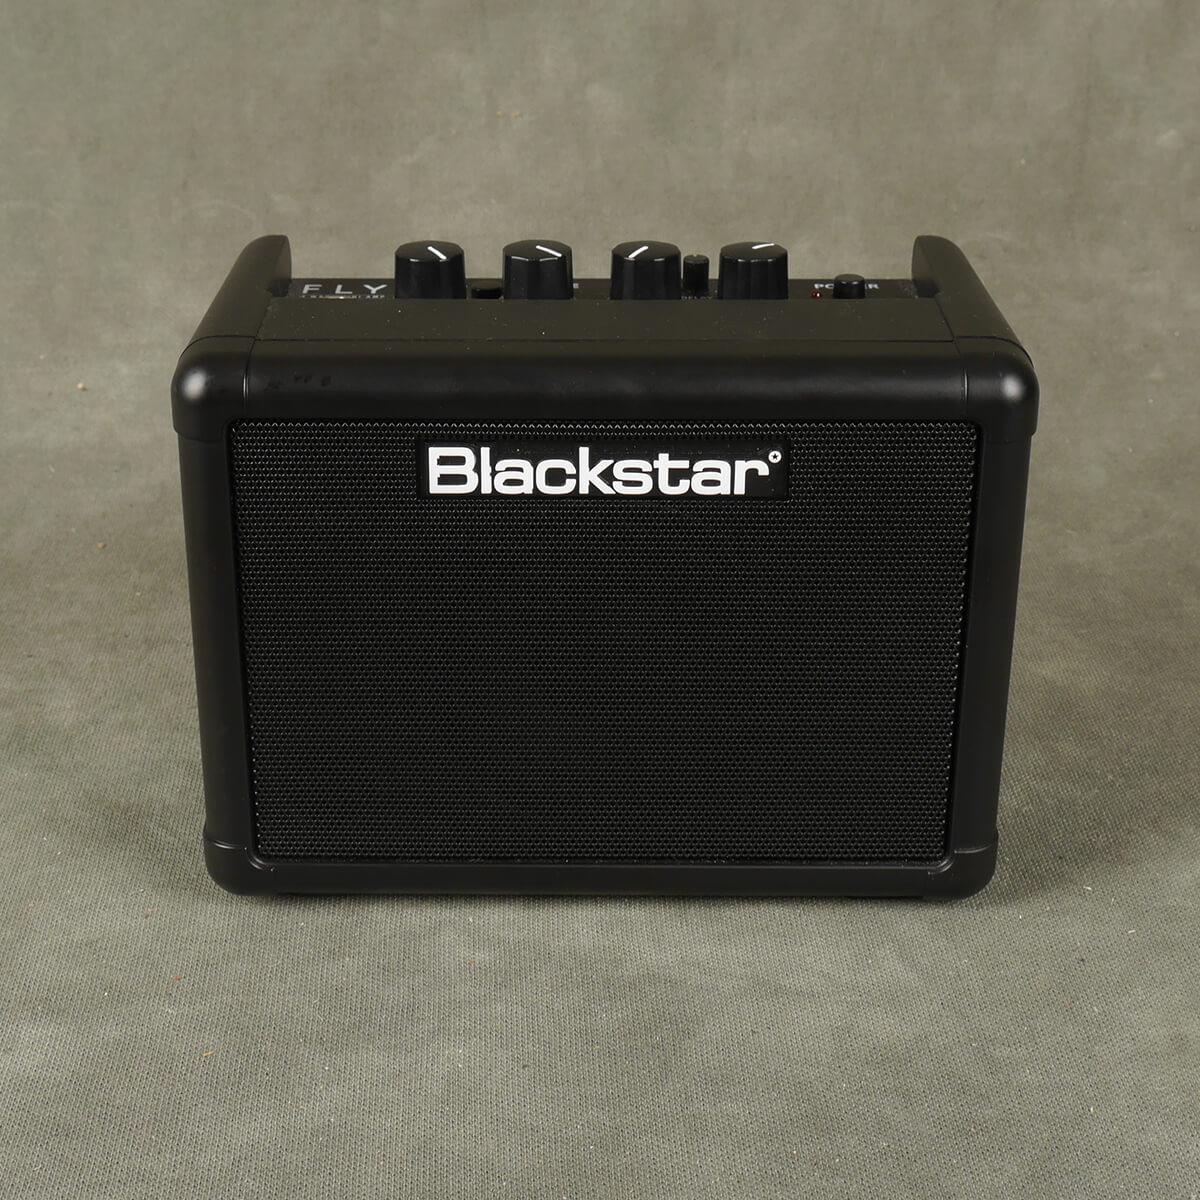 Blackstar Fly 3 Mini Amplifier - 2nd Hand